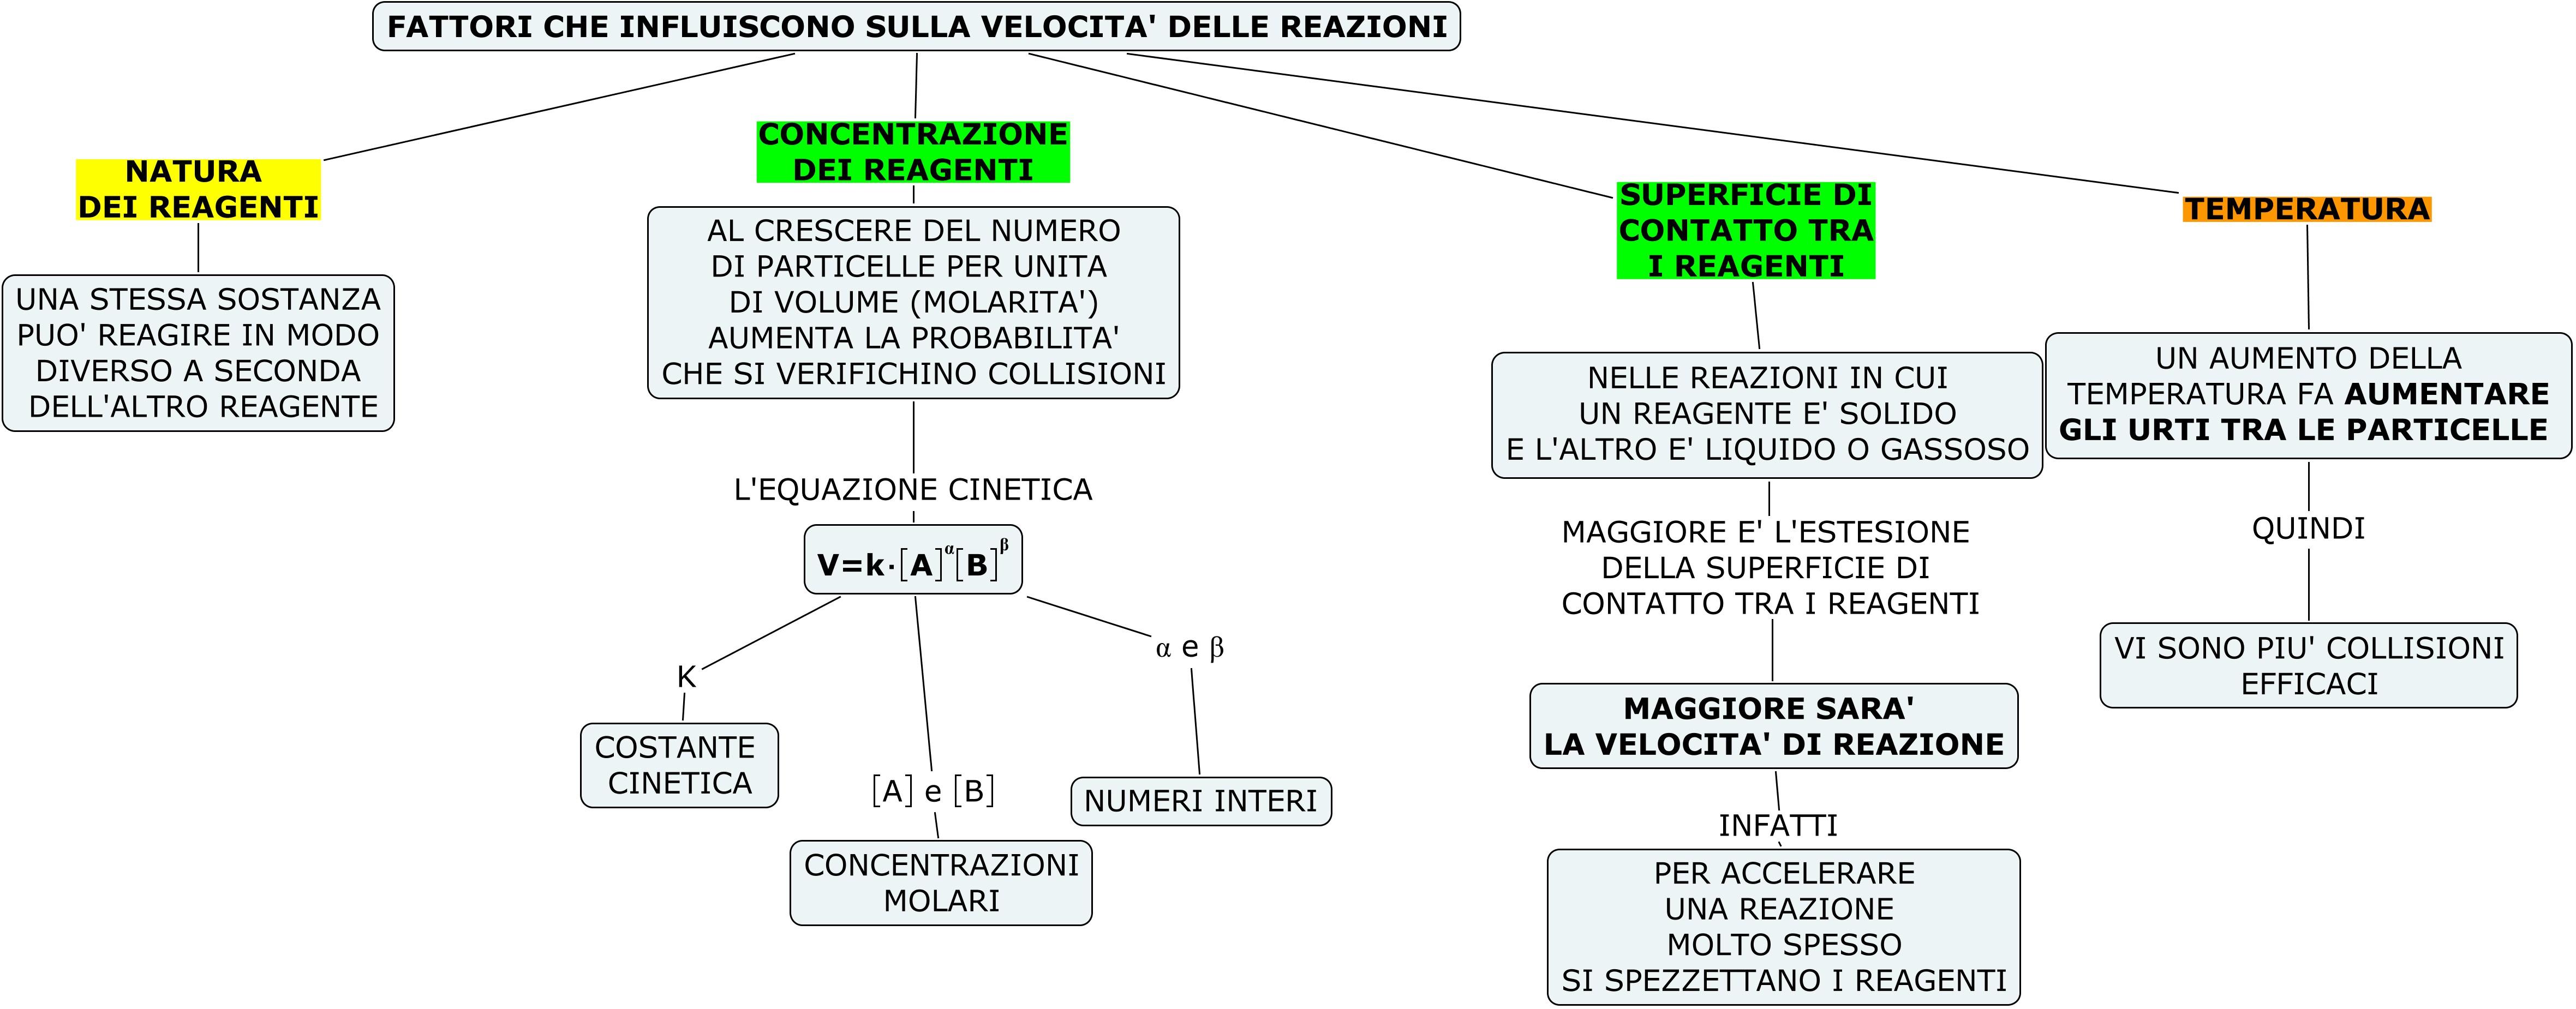 VELOCITA REAZIONE 3